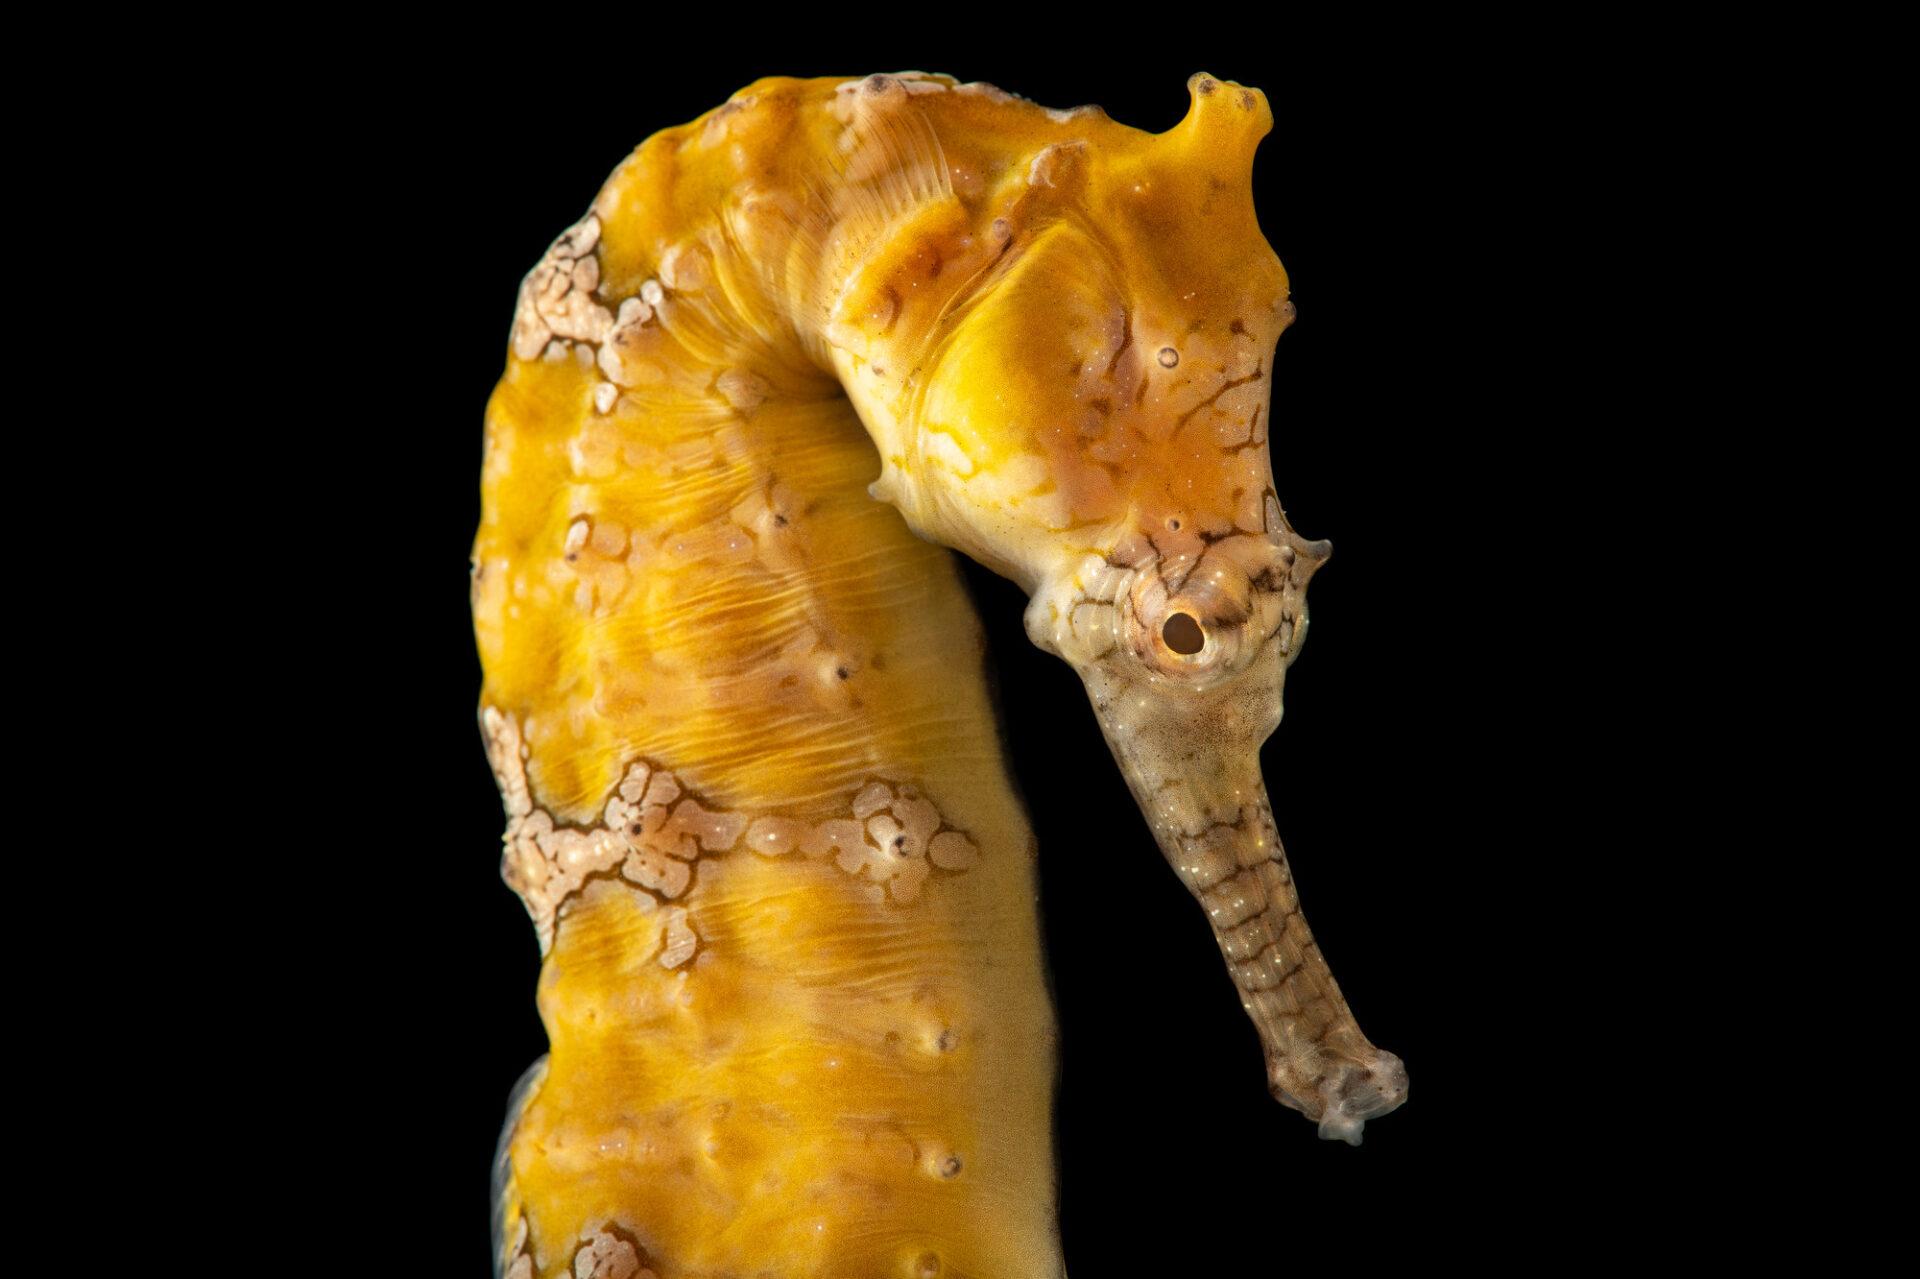 Photo: A West Australian seahorse (Hippocampus subelongatus) at Aquarium Berlin.